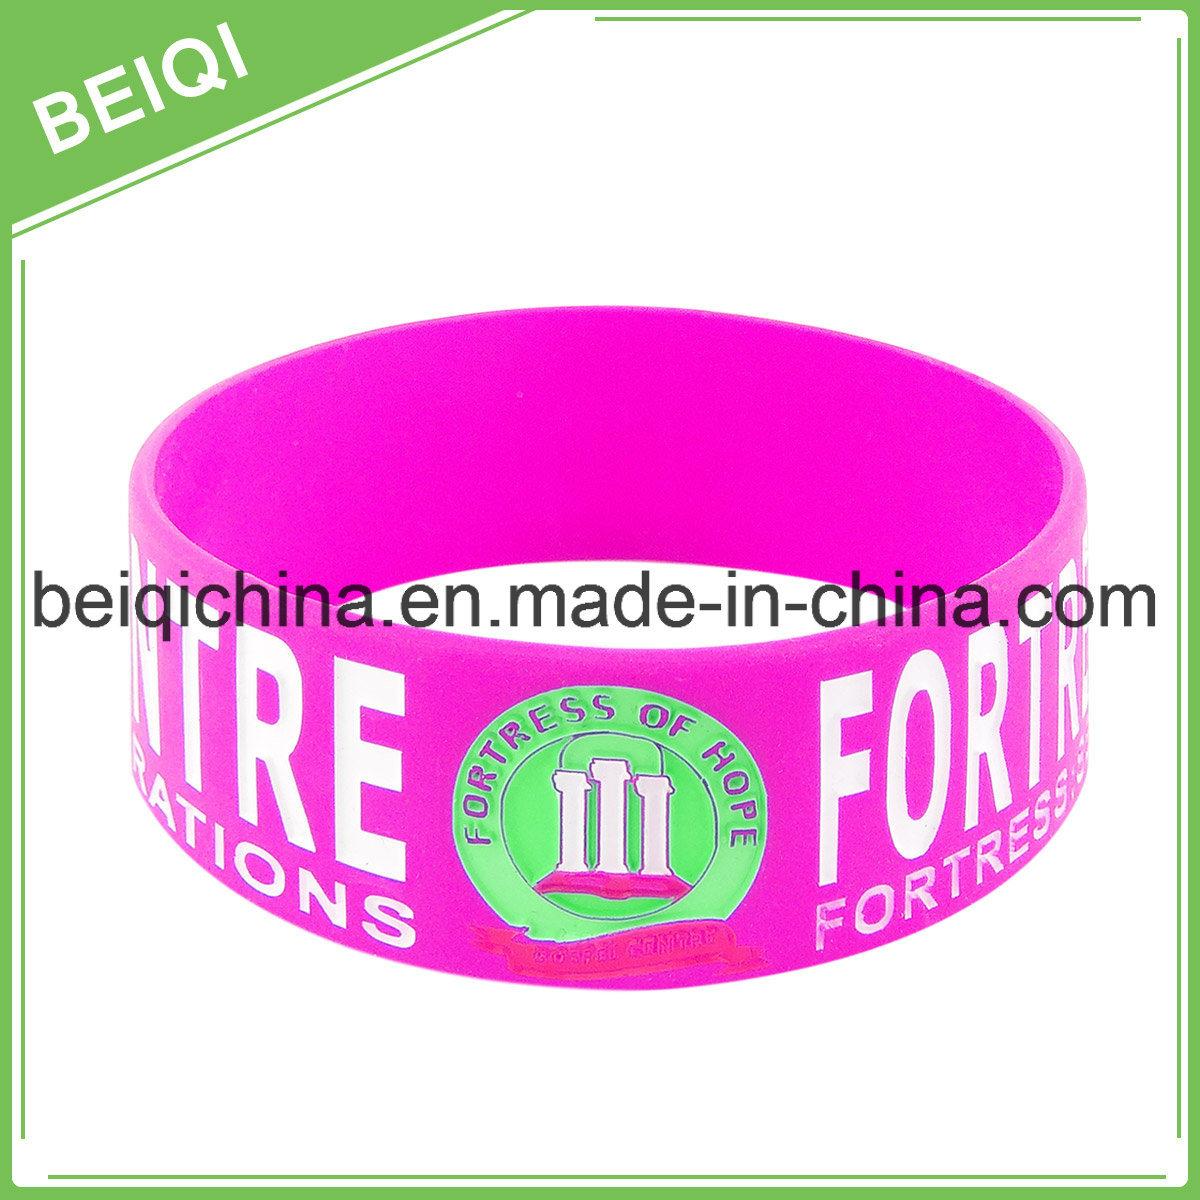 Personalized Rubber Silicone Bracelets